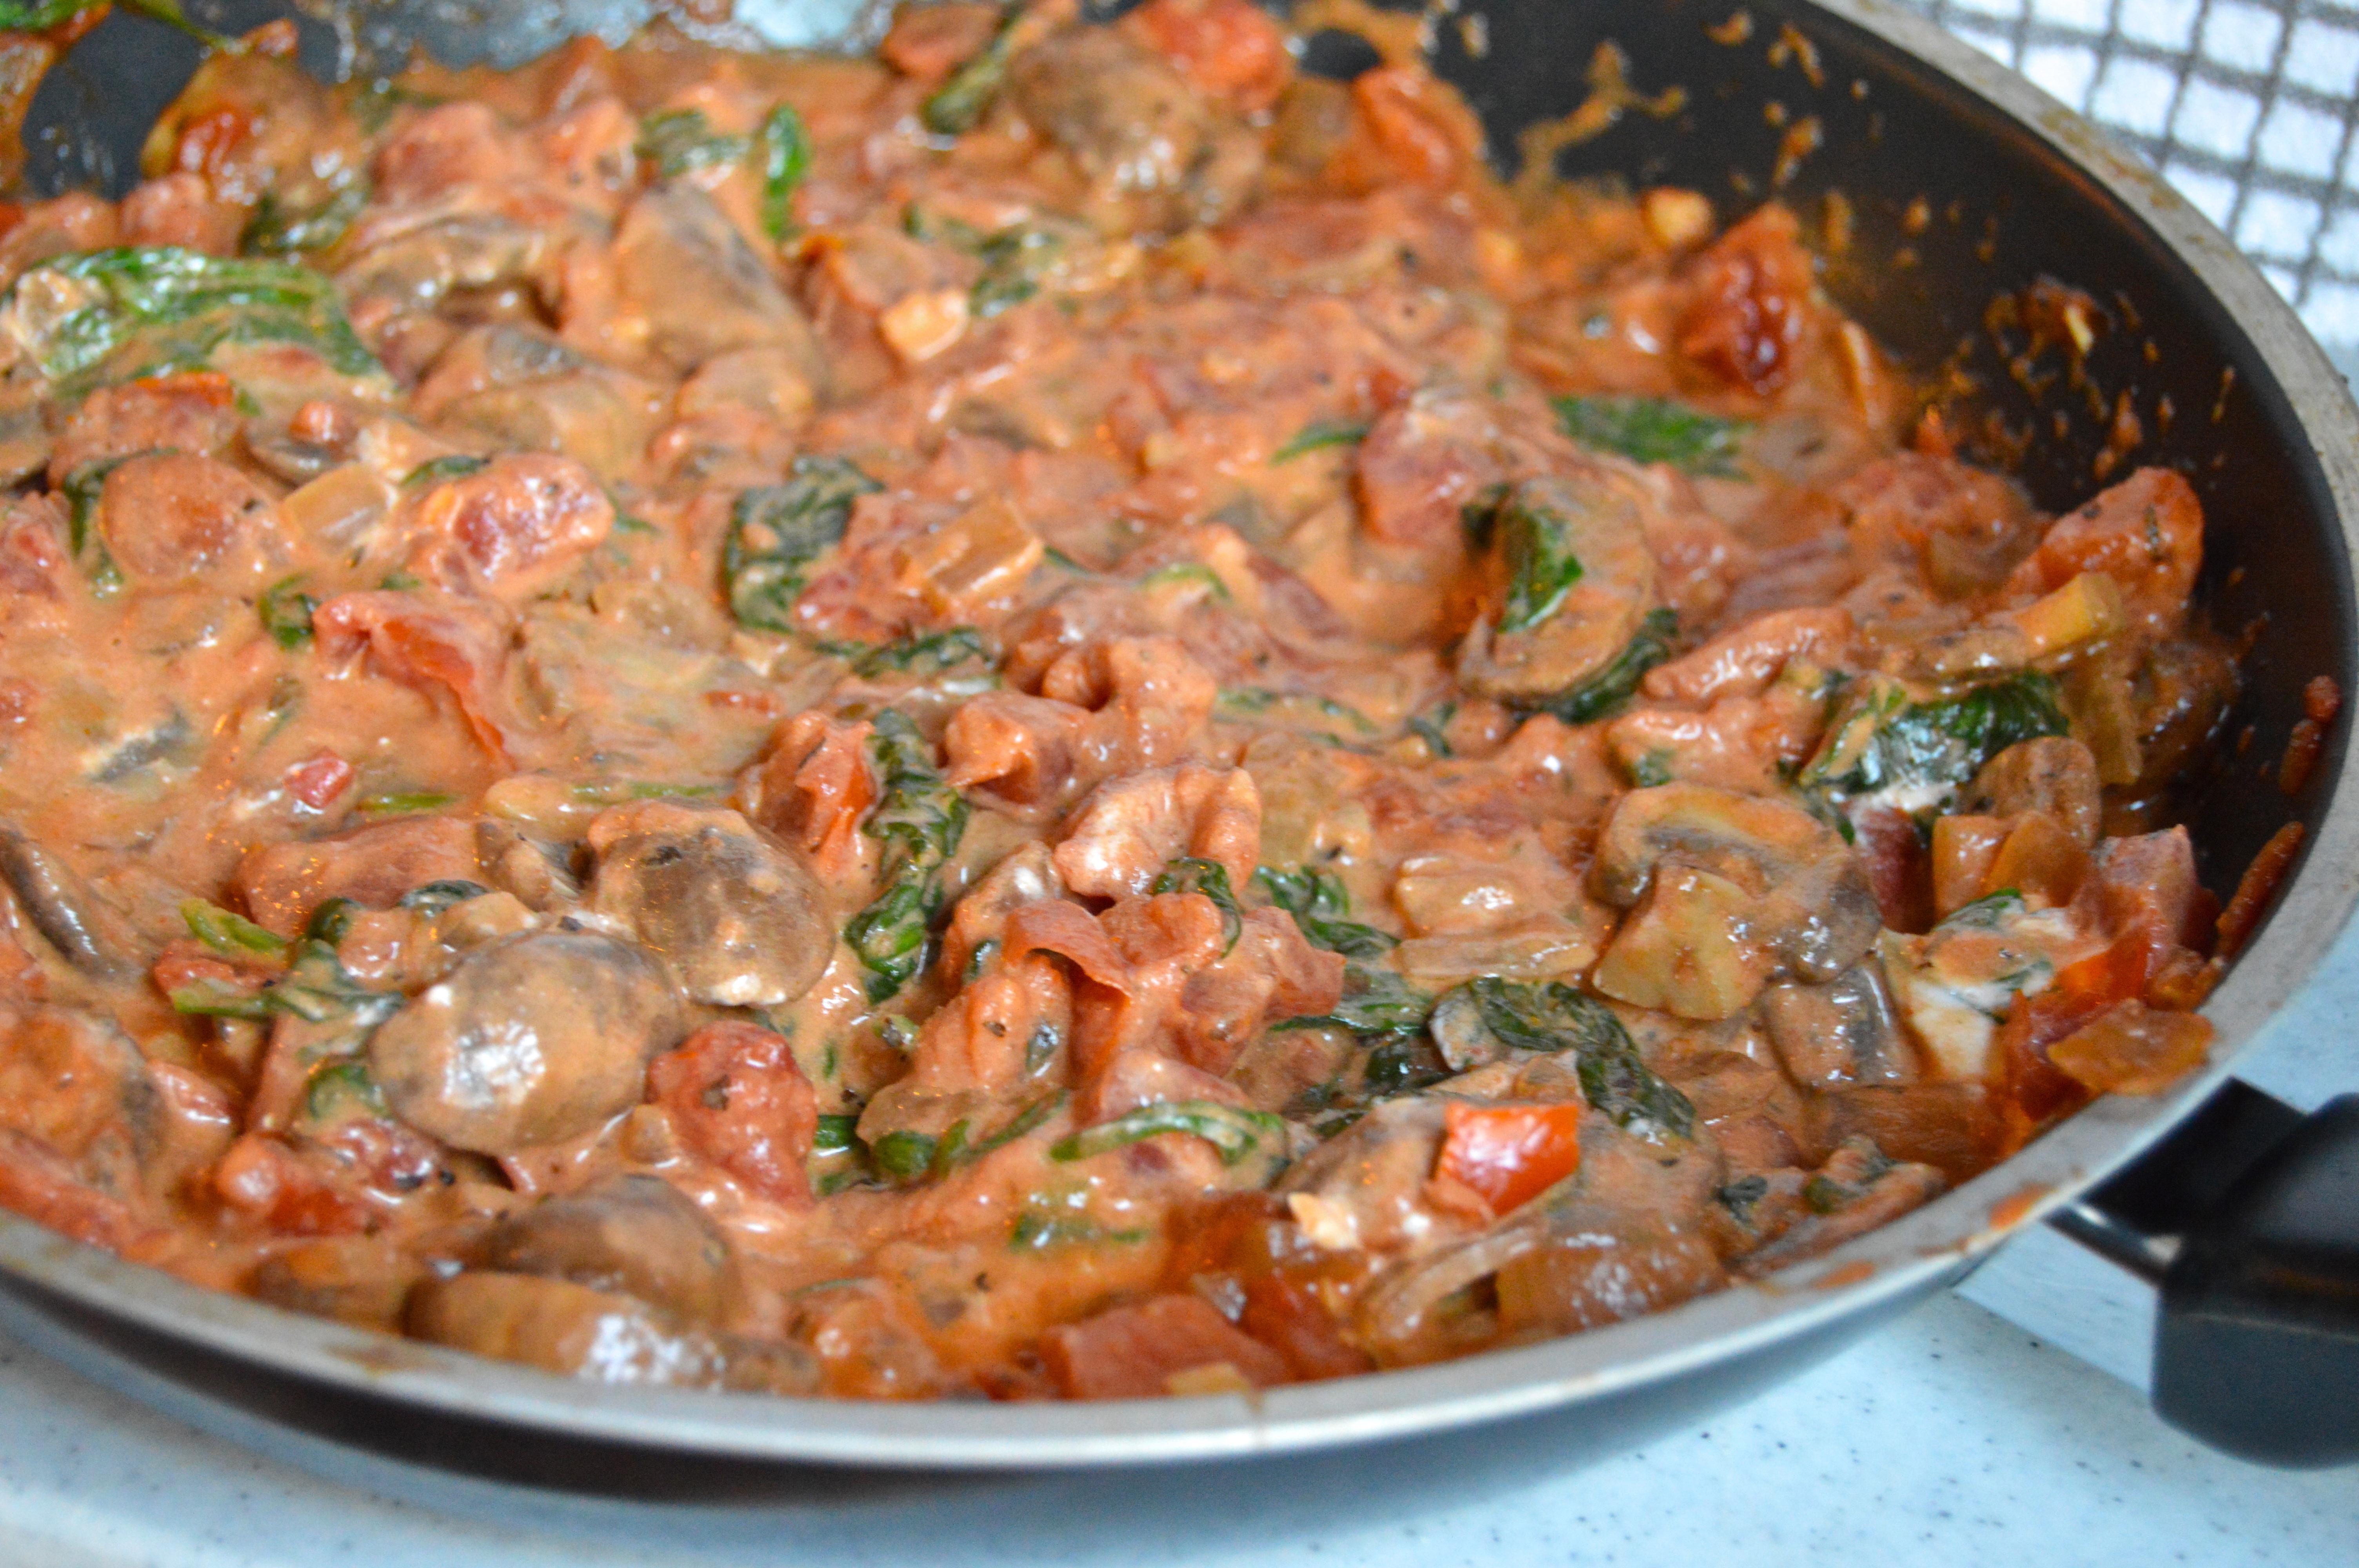 Goat Cheese And Mushroom Marinara Spaghetti Squash Pasta Serves 4 Start To Finish 35 Min For Sauce 50 Min For Sauce And Squash